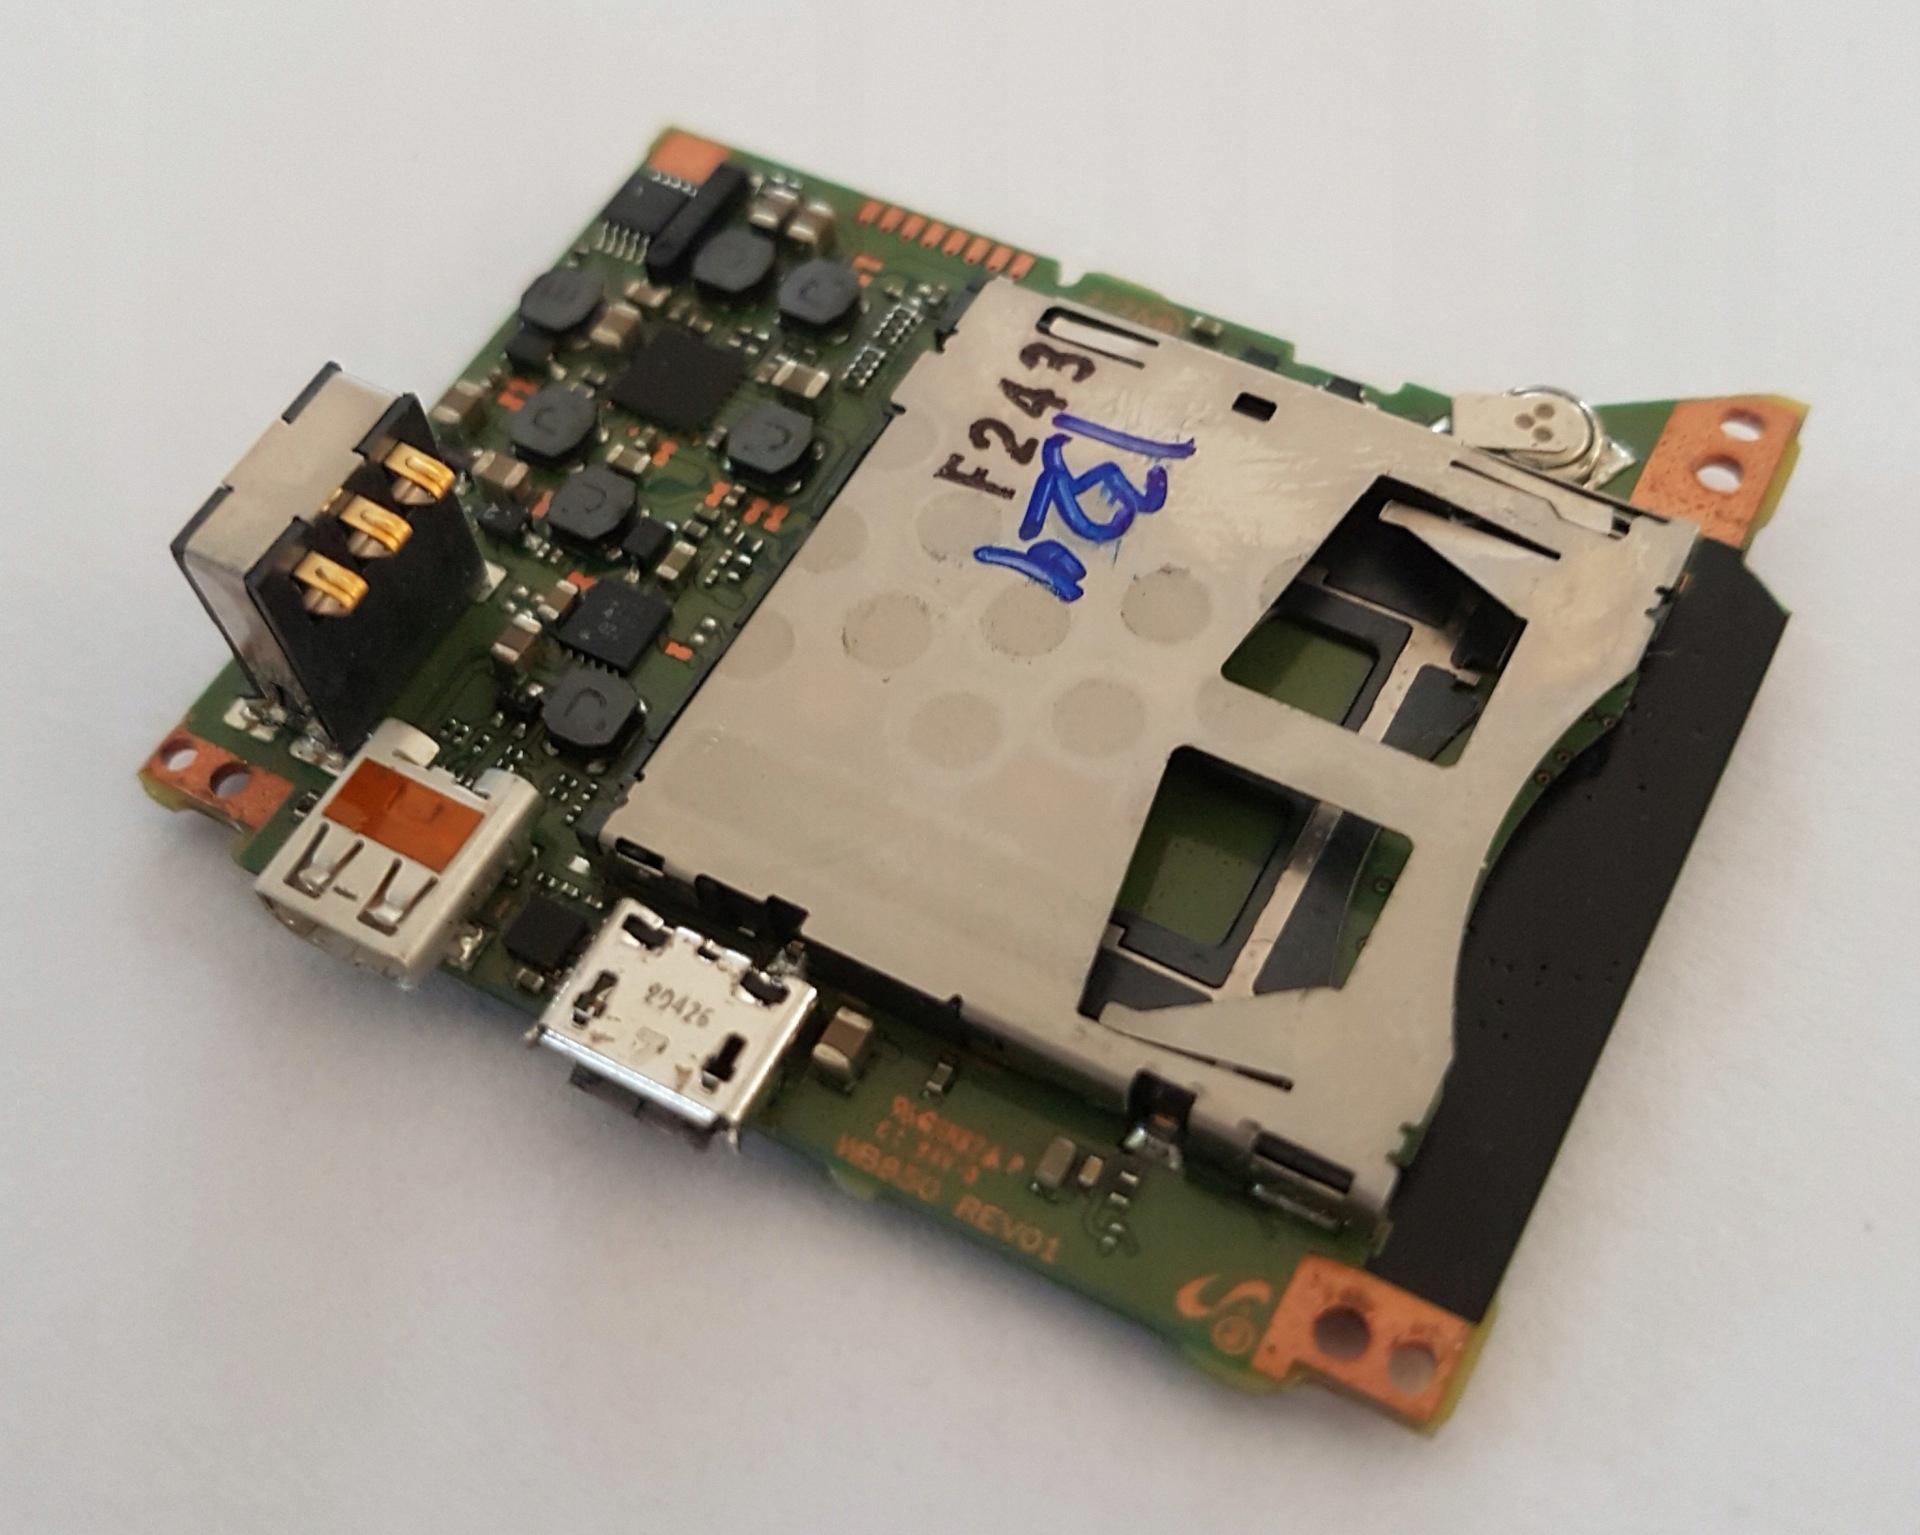 Płyta Główna Samsung WB850F Wi-Fi GPS Full HD 21x